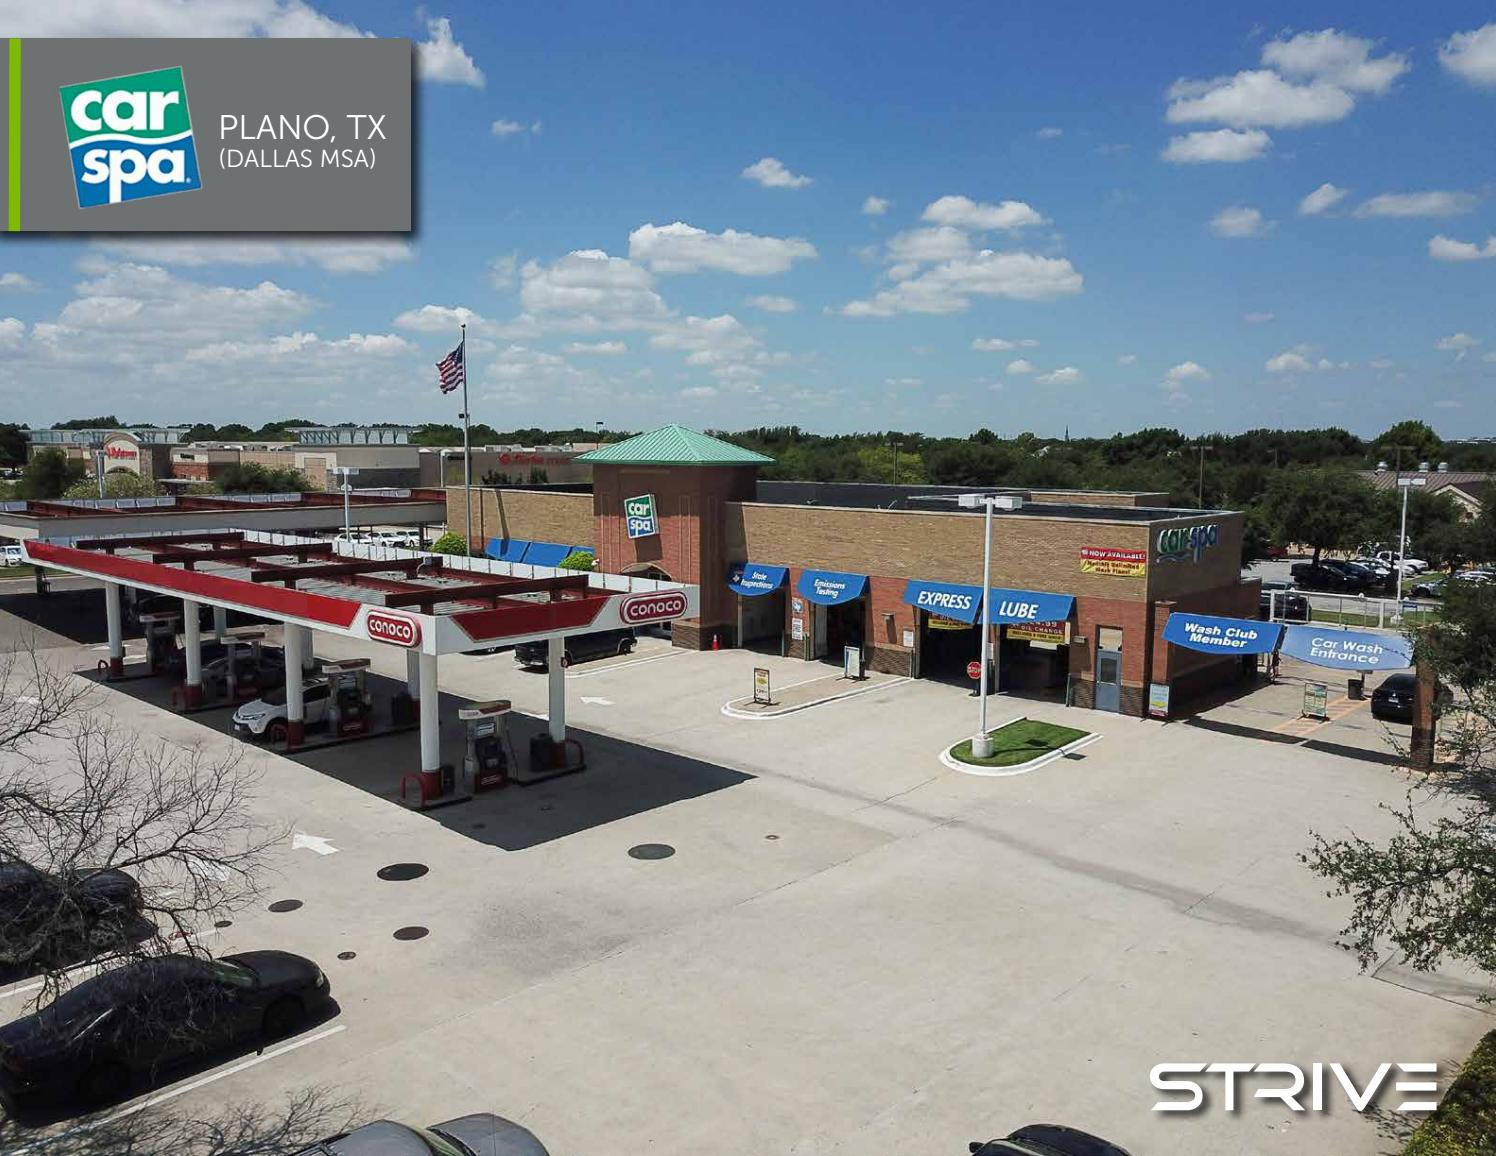 Car Spa - Plano, TX by STRIVE - issuu